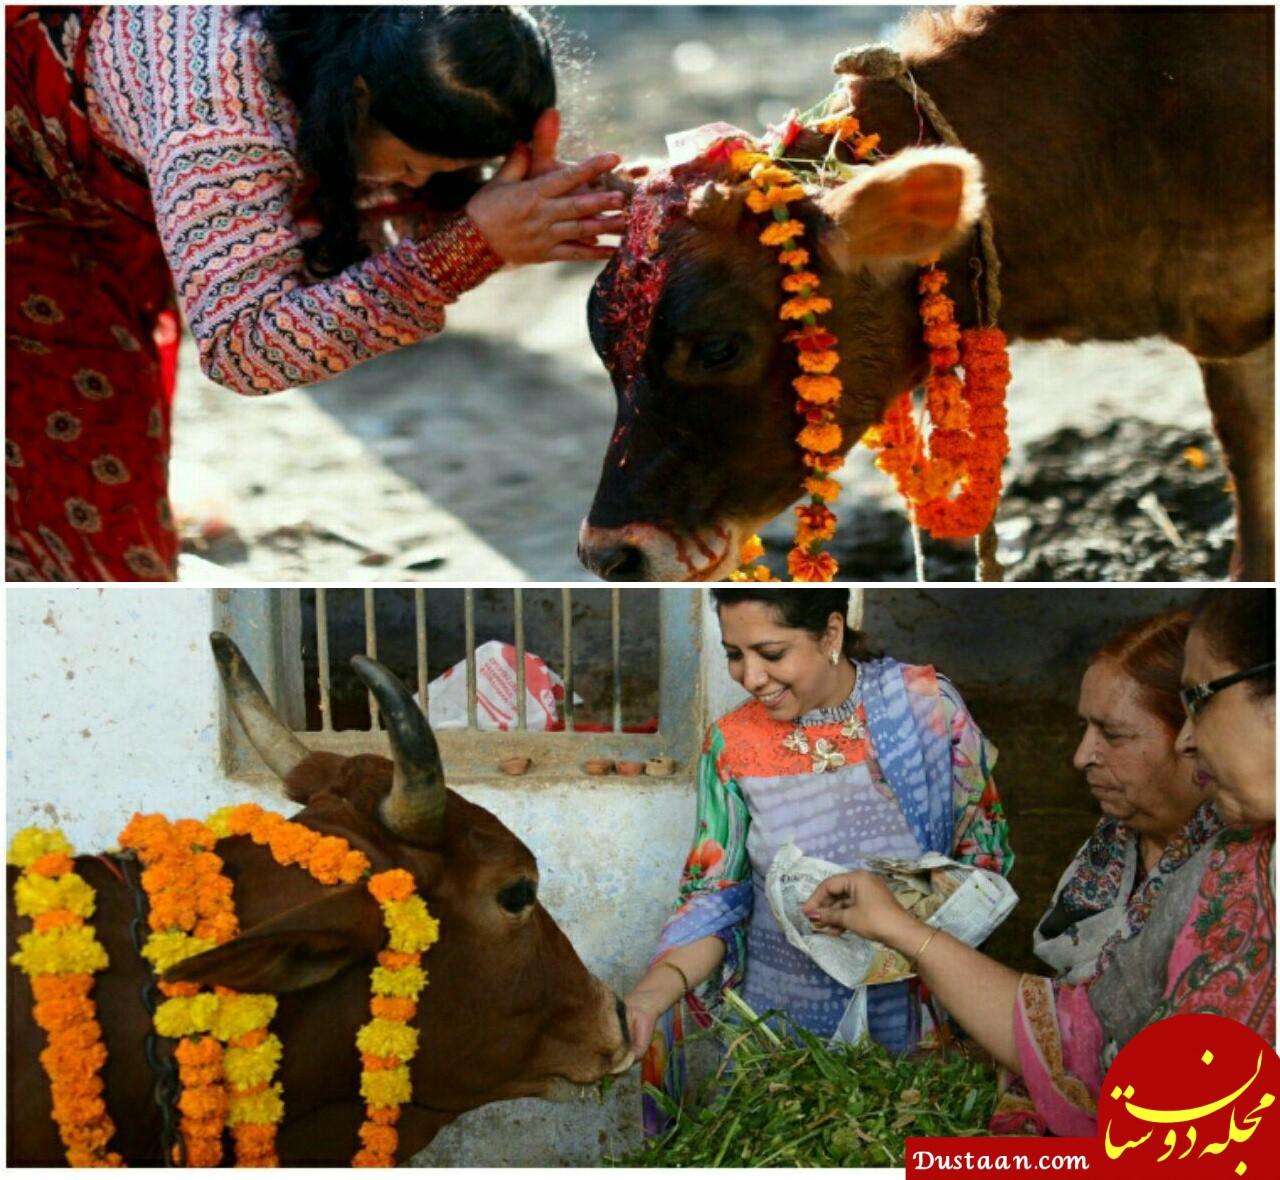 www.dustaan.com پرستش گاو در هند / ذبح گاو در غرب هند حبس ابد دارد!